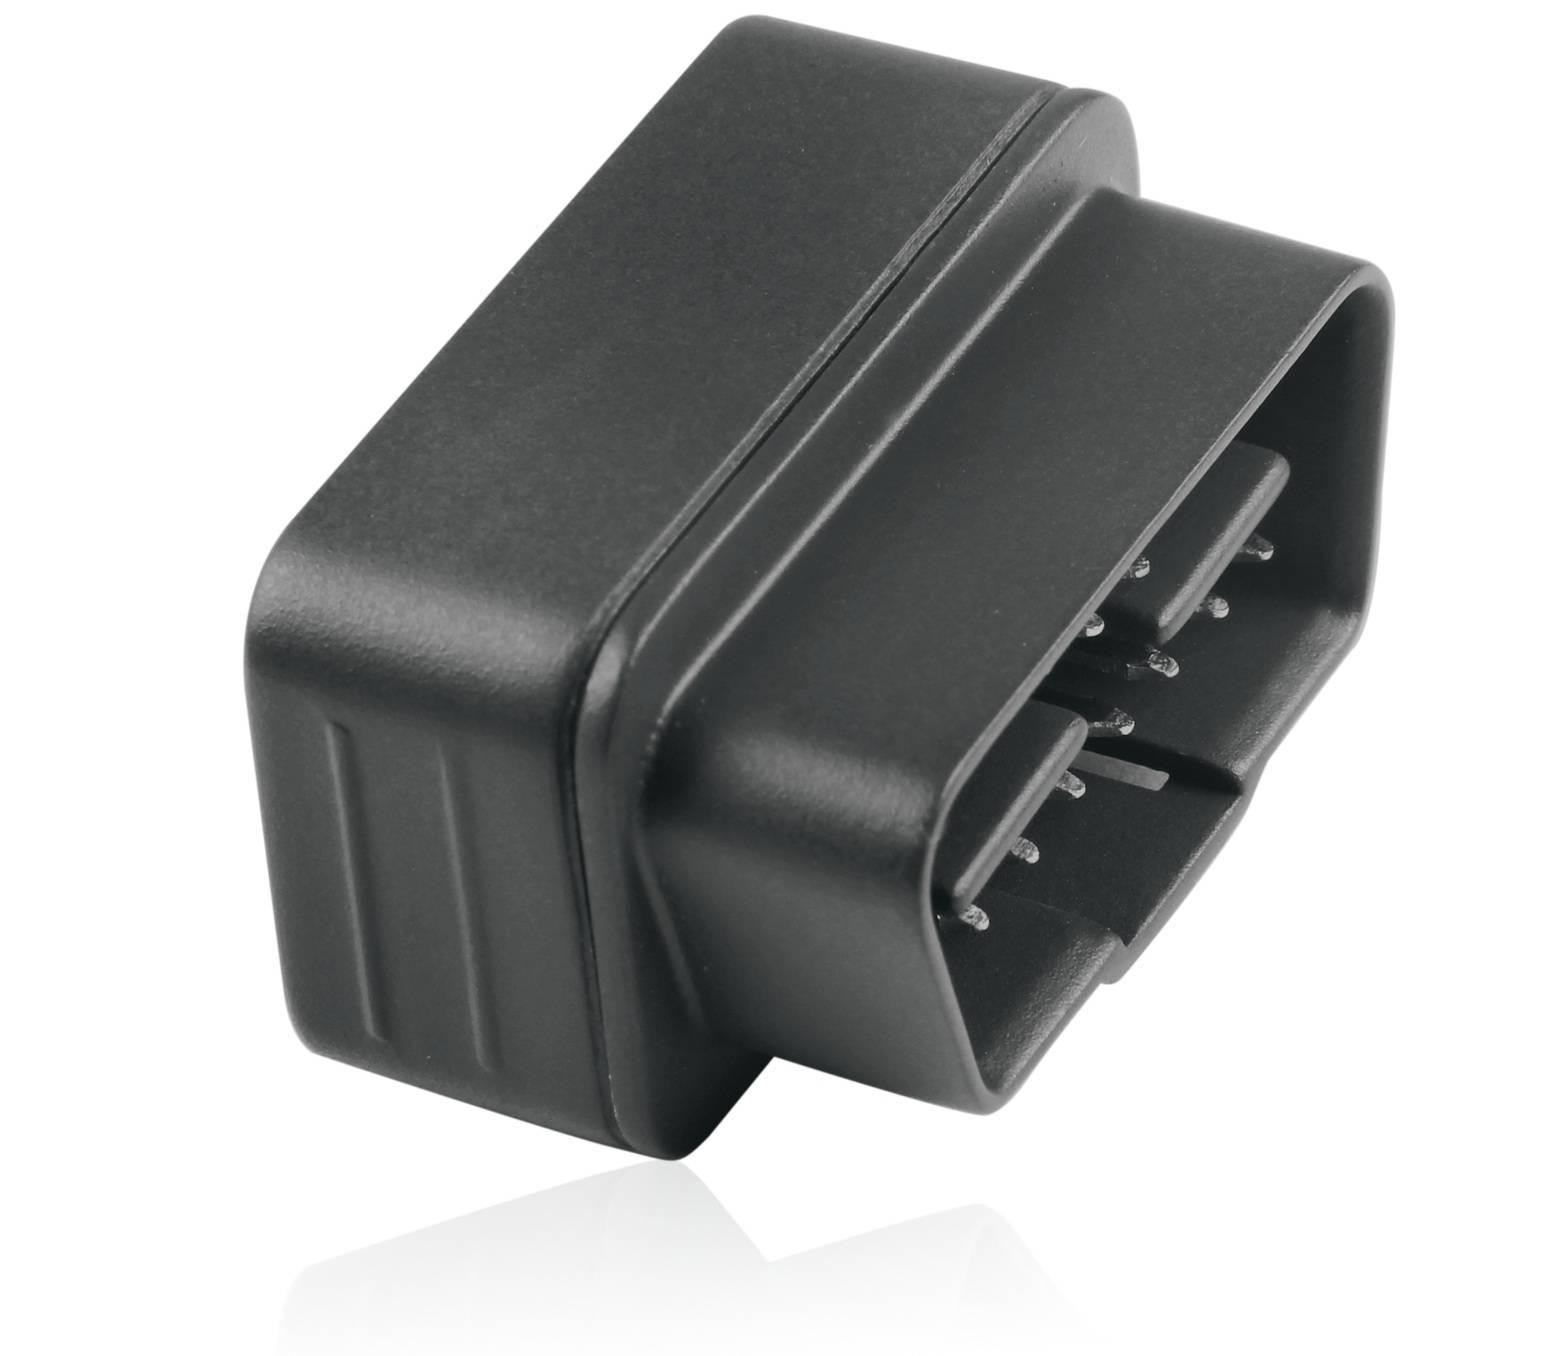 IDD-215B Bluetooth OBD Diagnostic Scanner